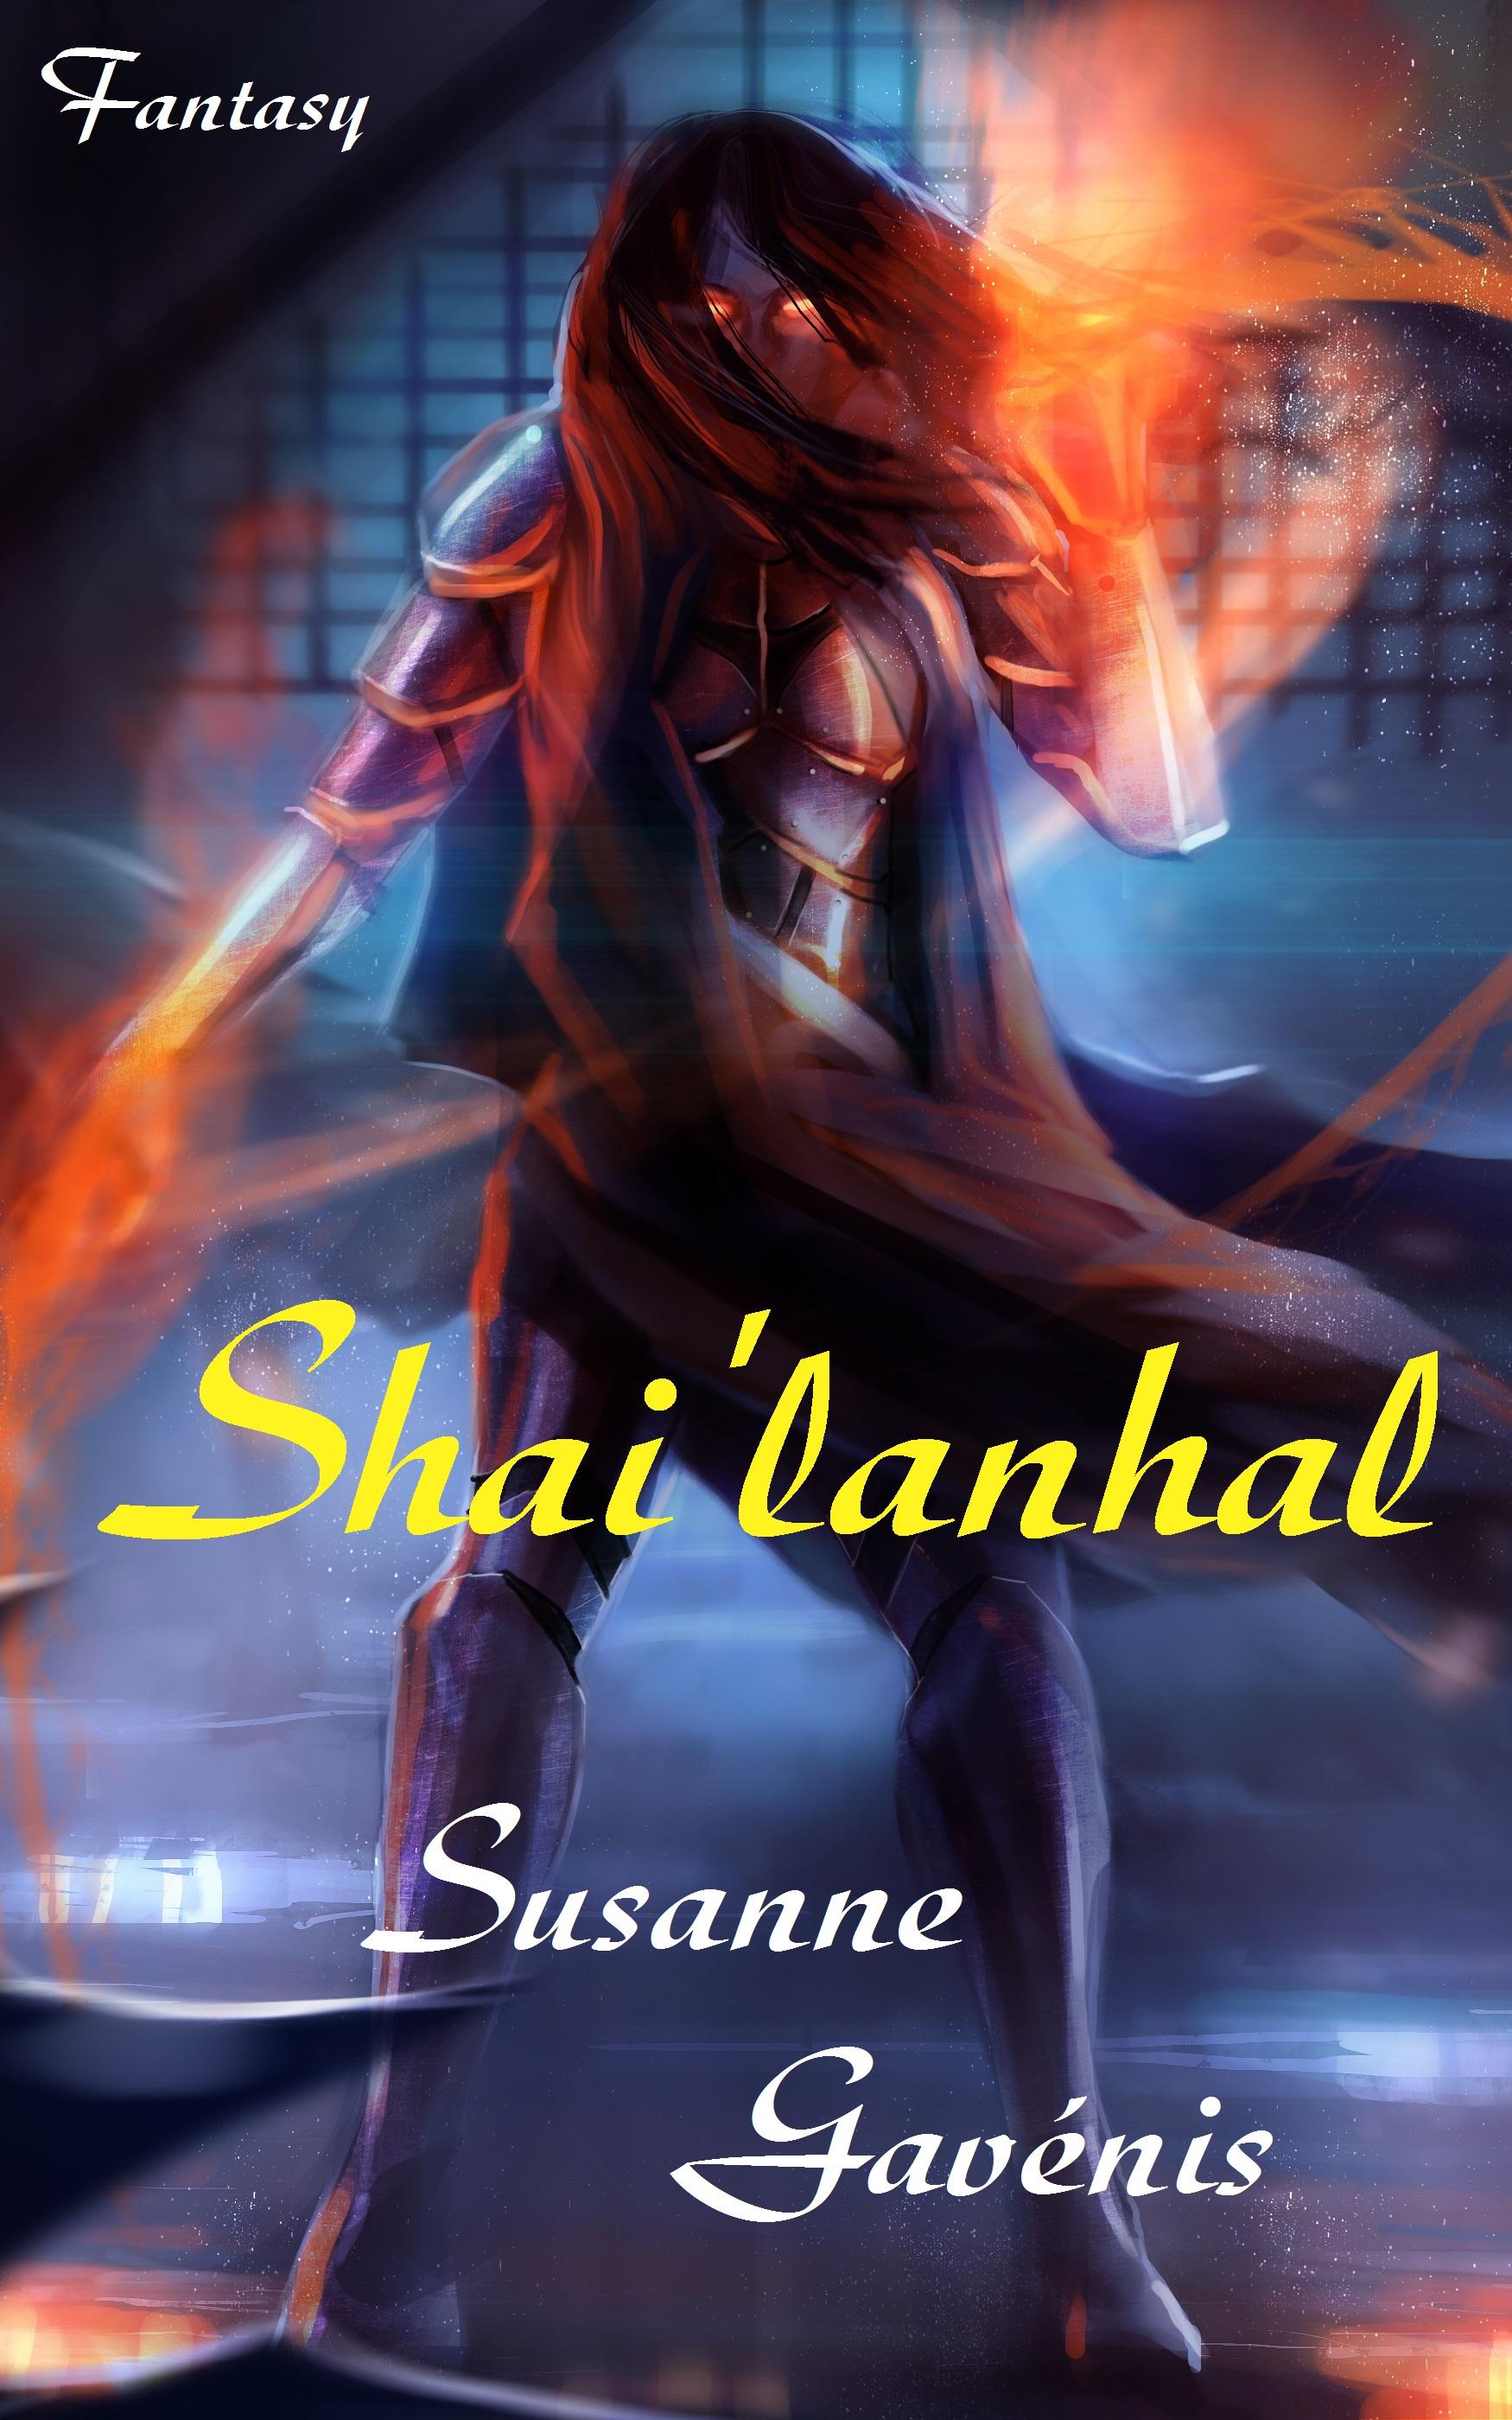 Shai'lanhal, Susanne Gavenis Gavenis_Shailanhal_Cover_Final